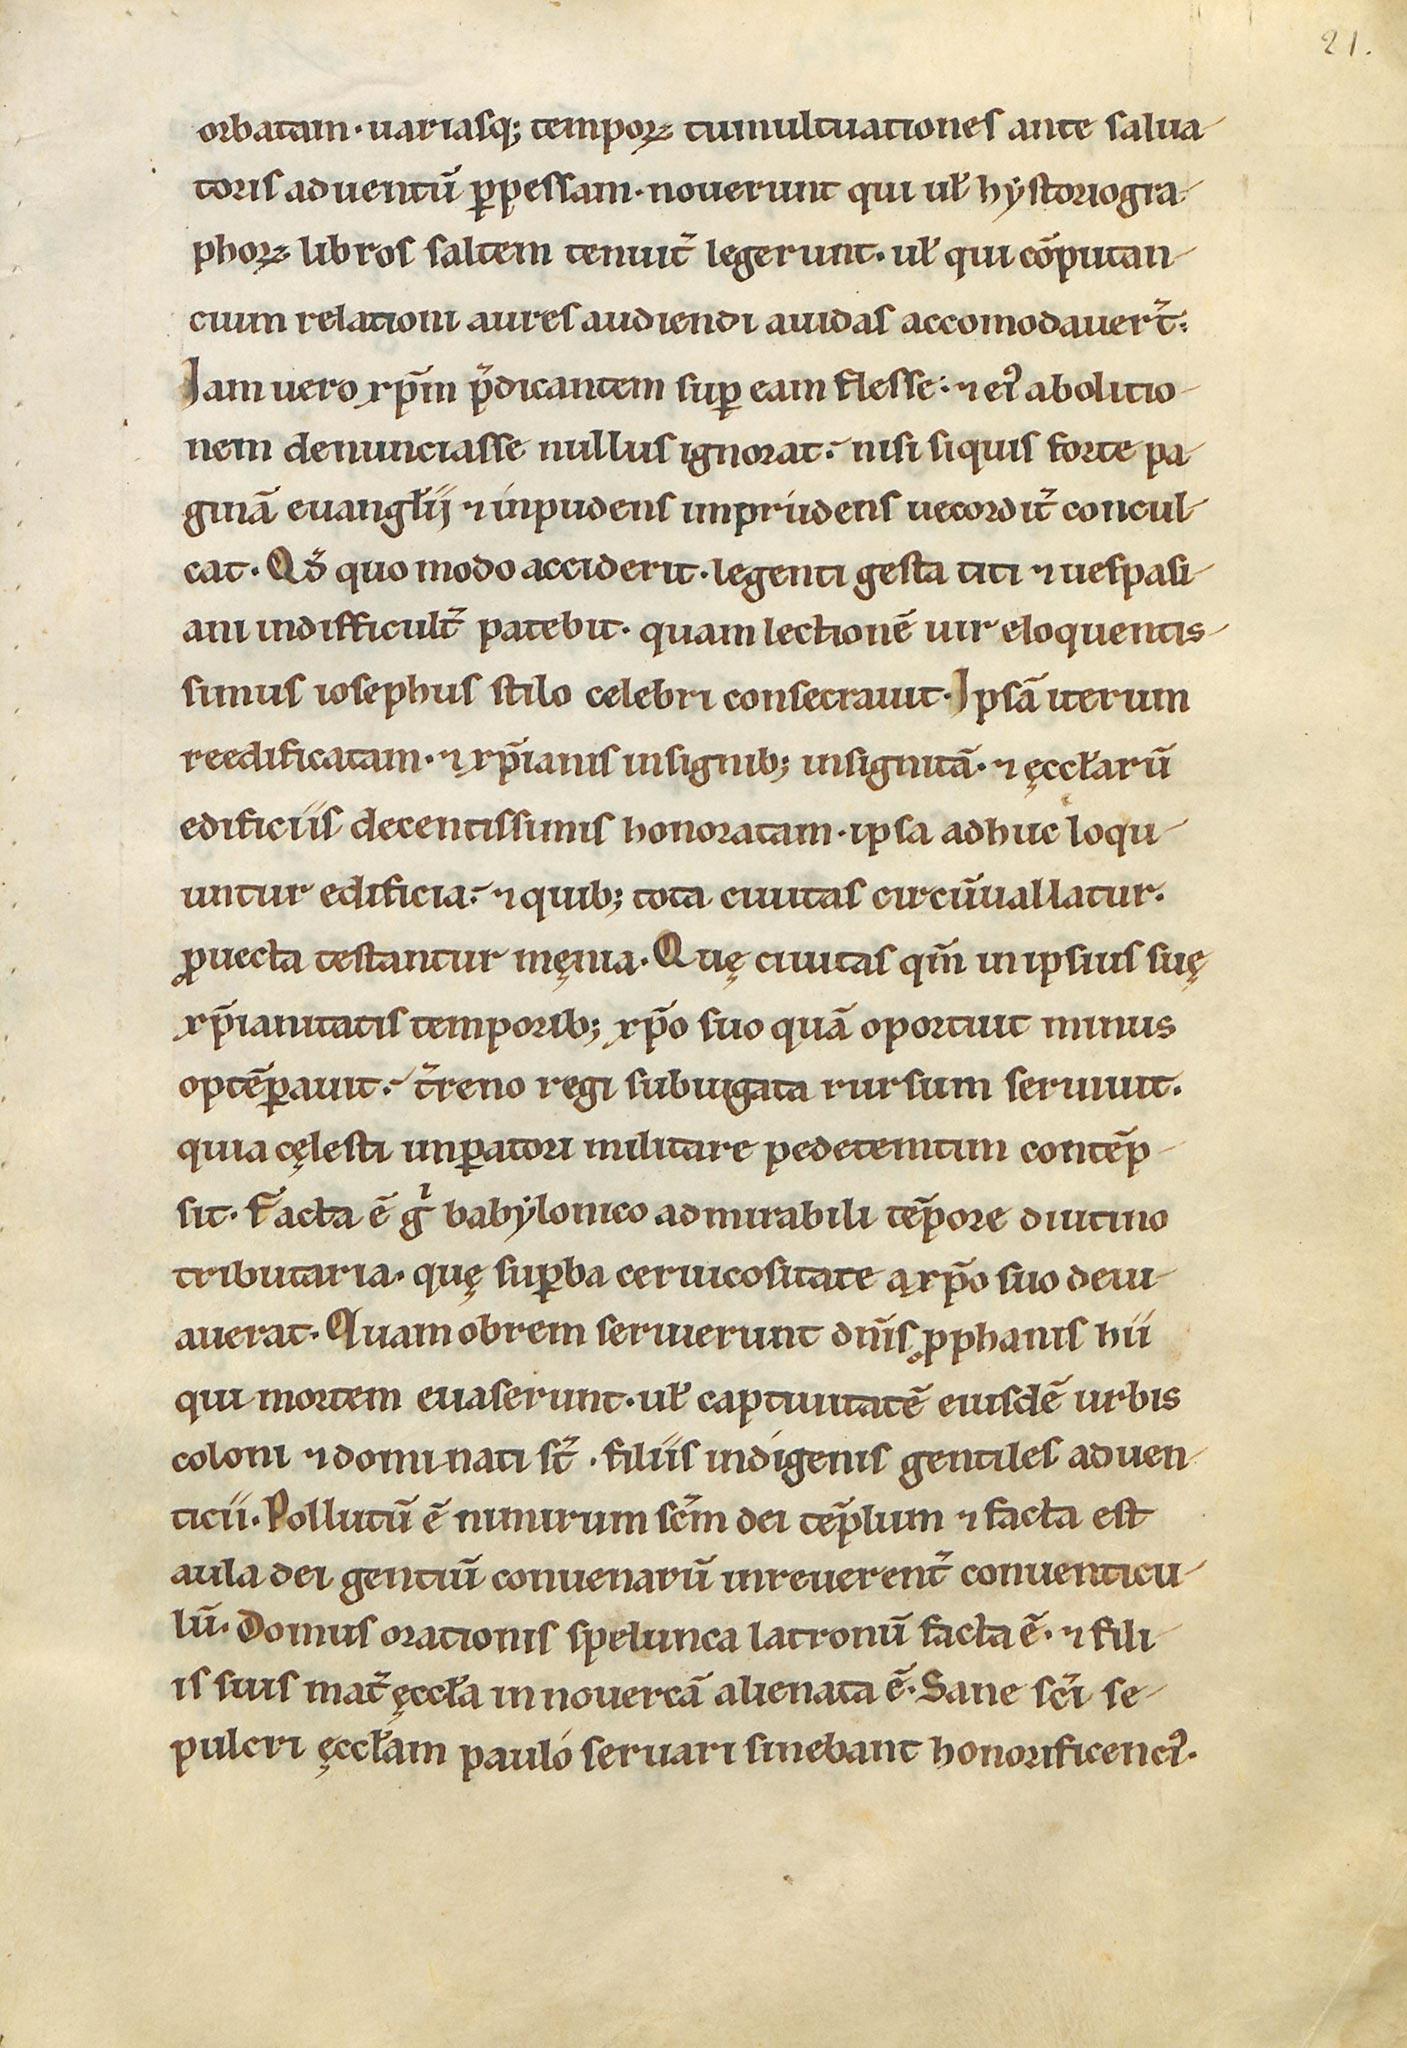 Manuscrit-Historia-Hierosolimitana-21r°